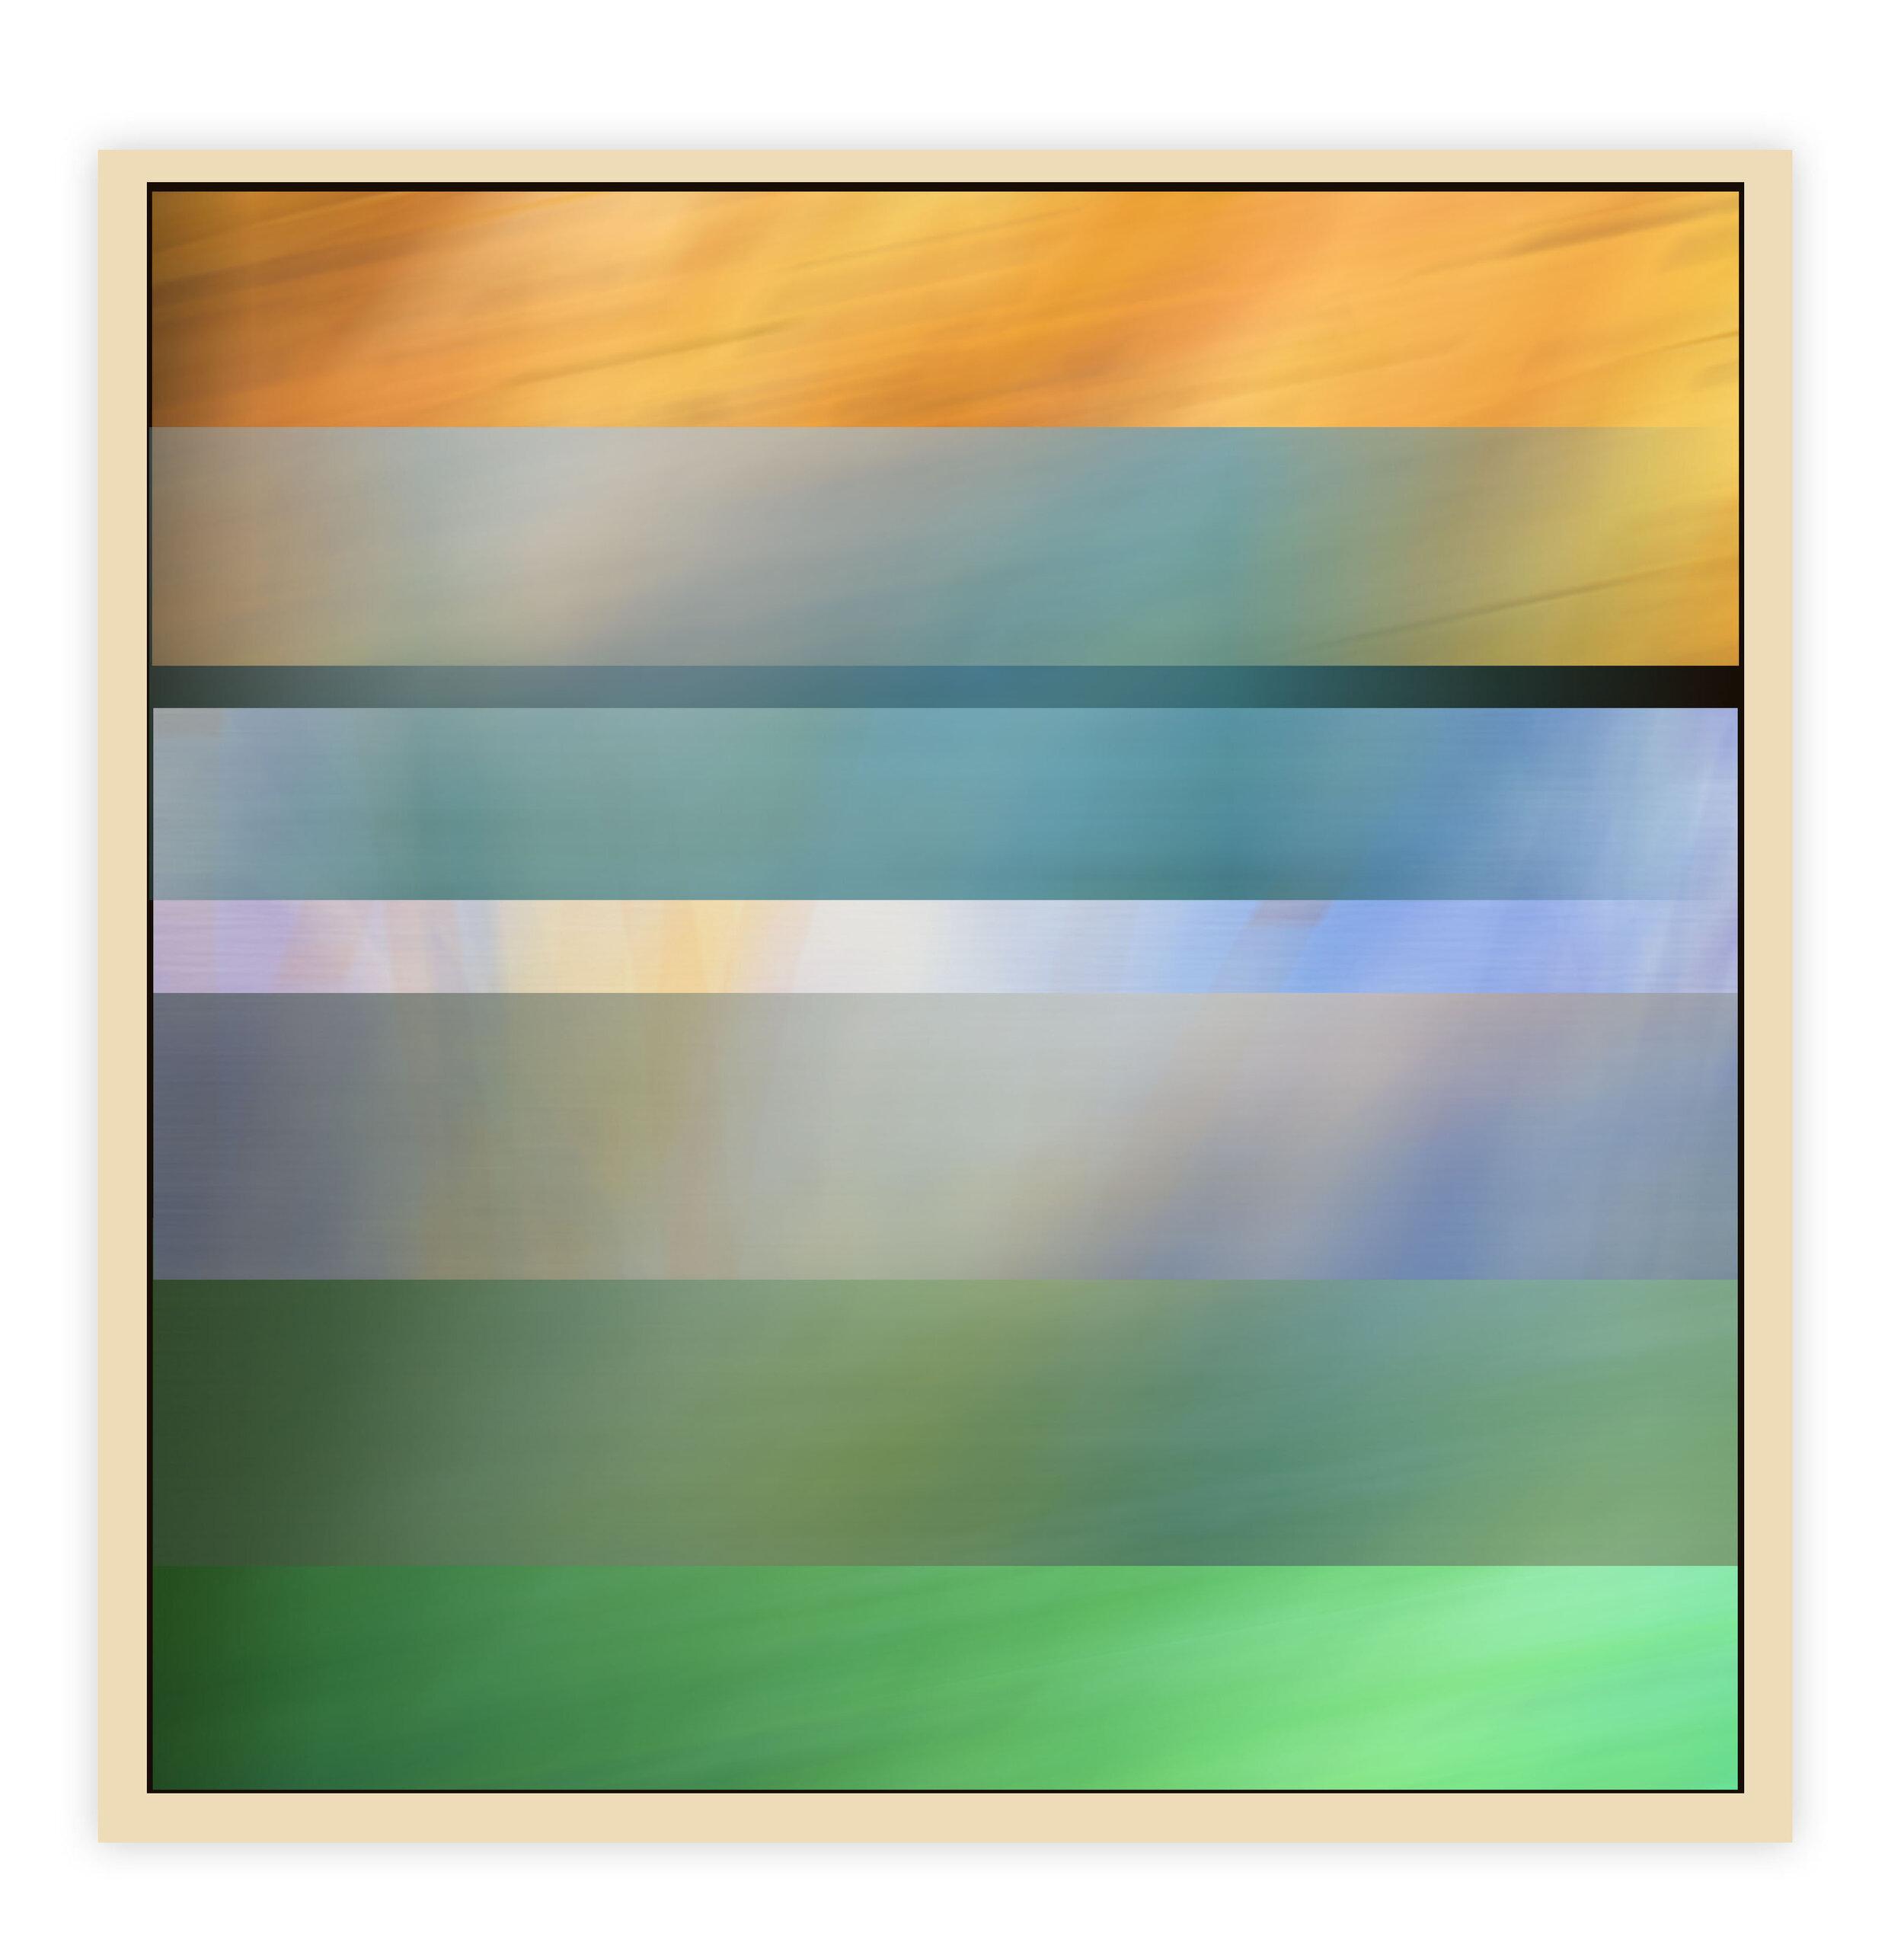 Concept palette utilizing digital manipulation/enhancement